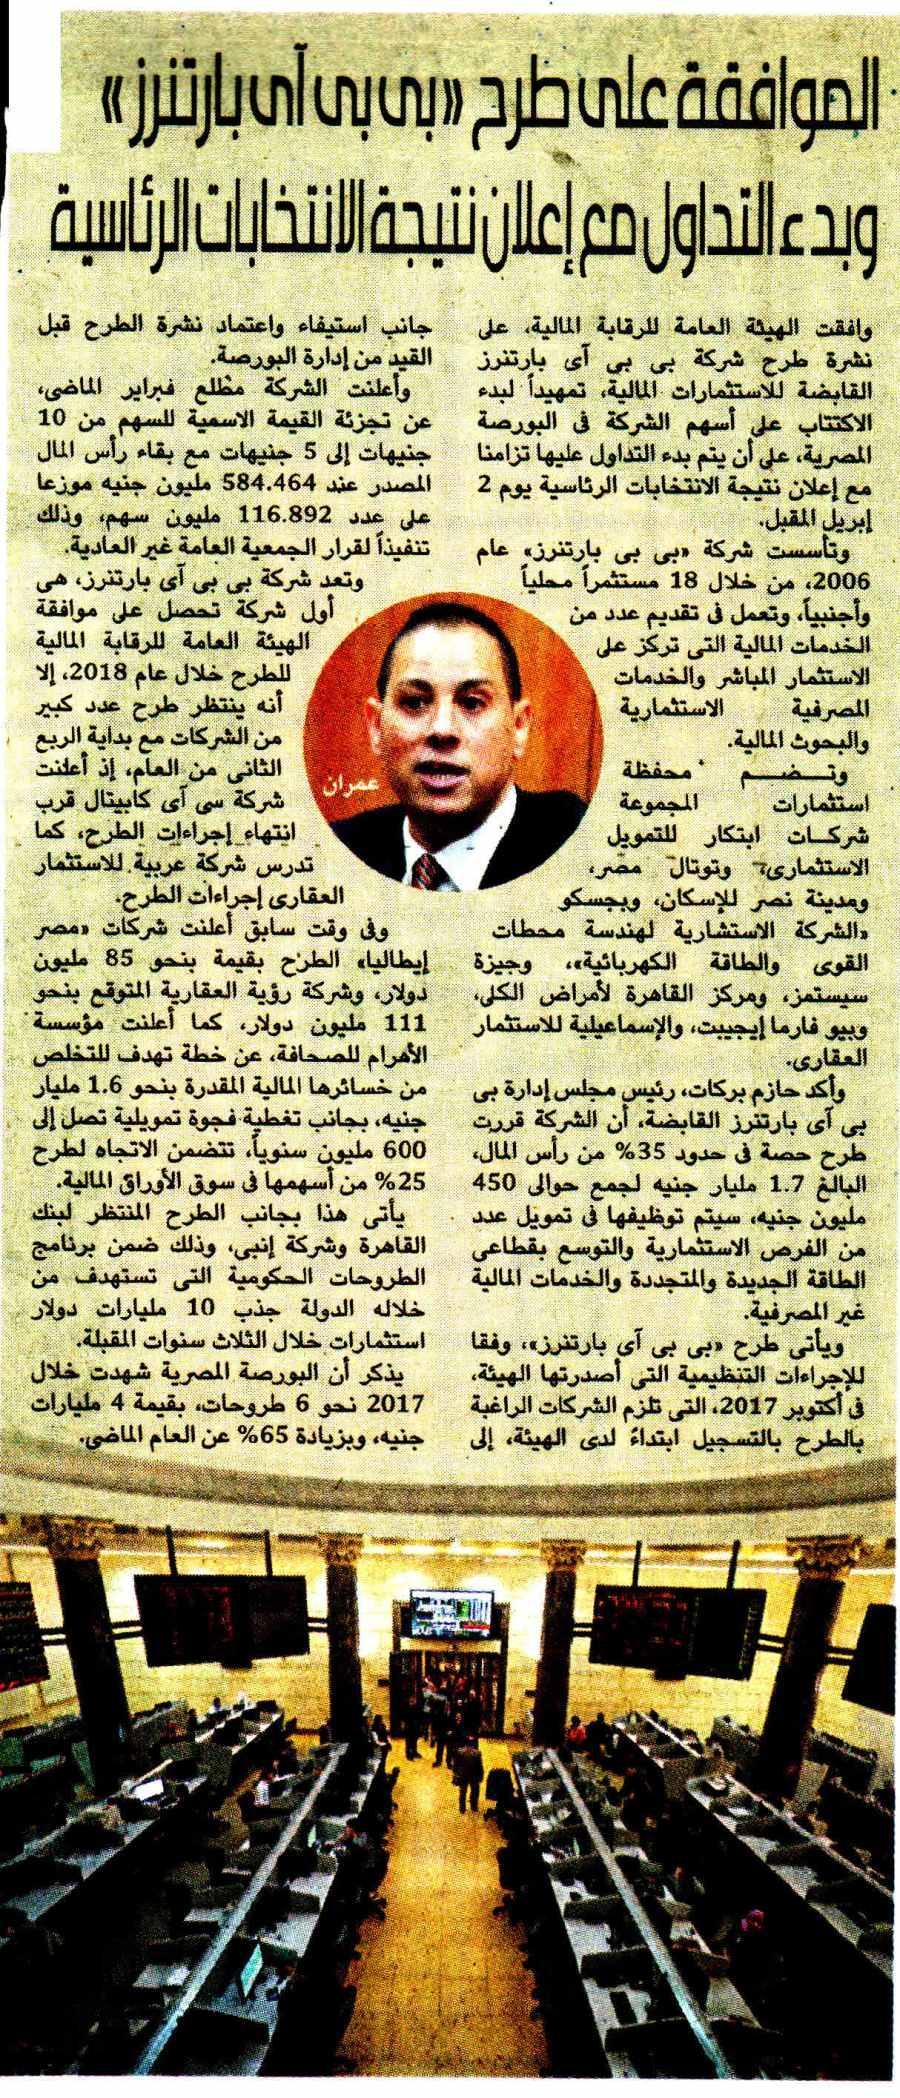 Al Youm 7 6 March P.7.jpg